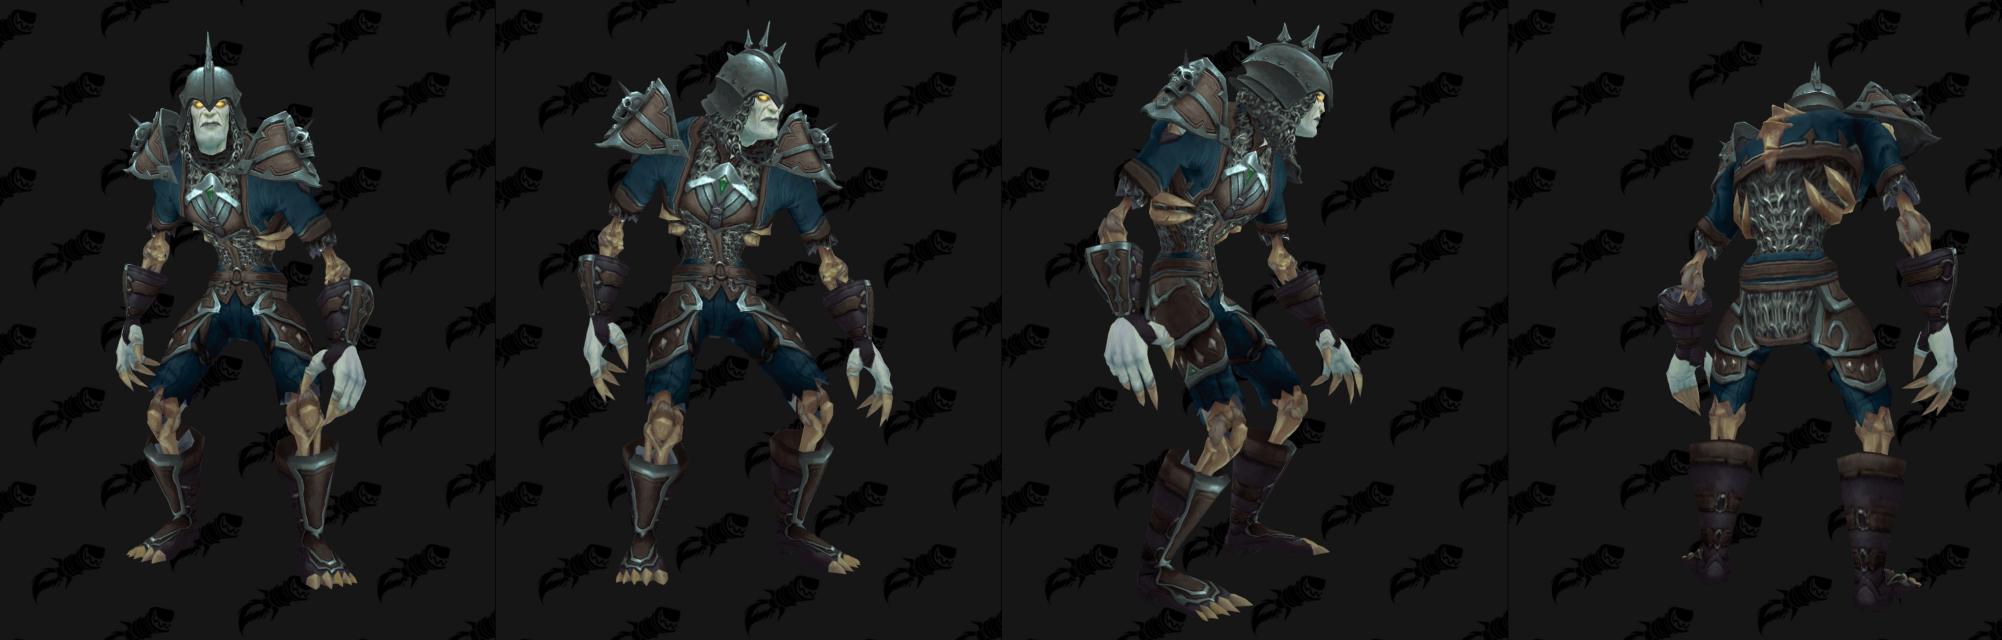 Armure Mailles Horde - Front de guerre Sombrivage Tier 1